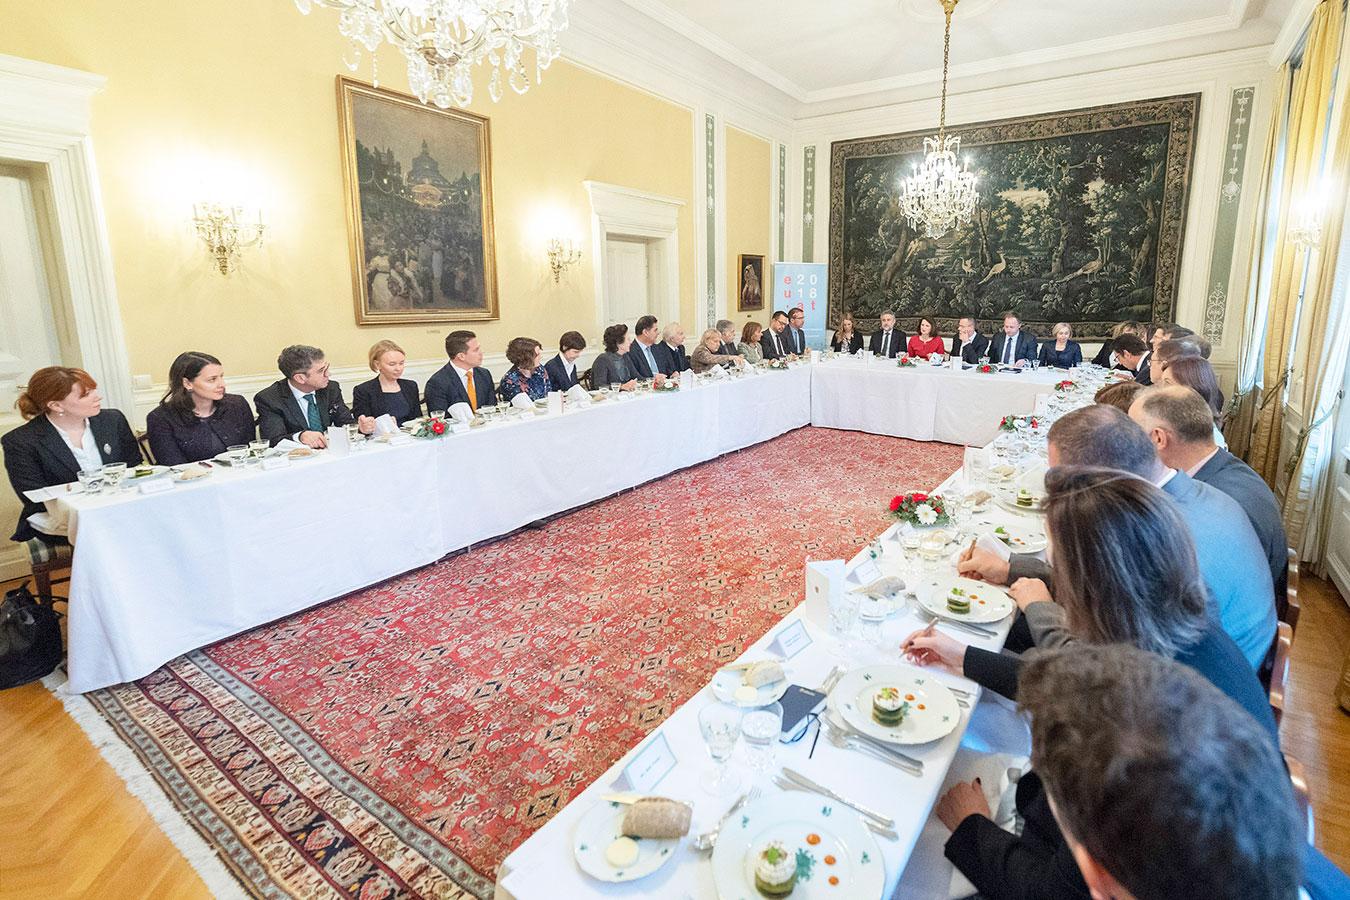 a-elisabeth-ellison-kramer-working-luncheon-austrian-presidency-2018.jpg